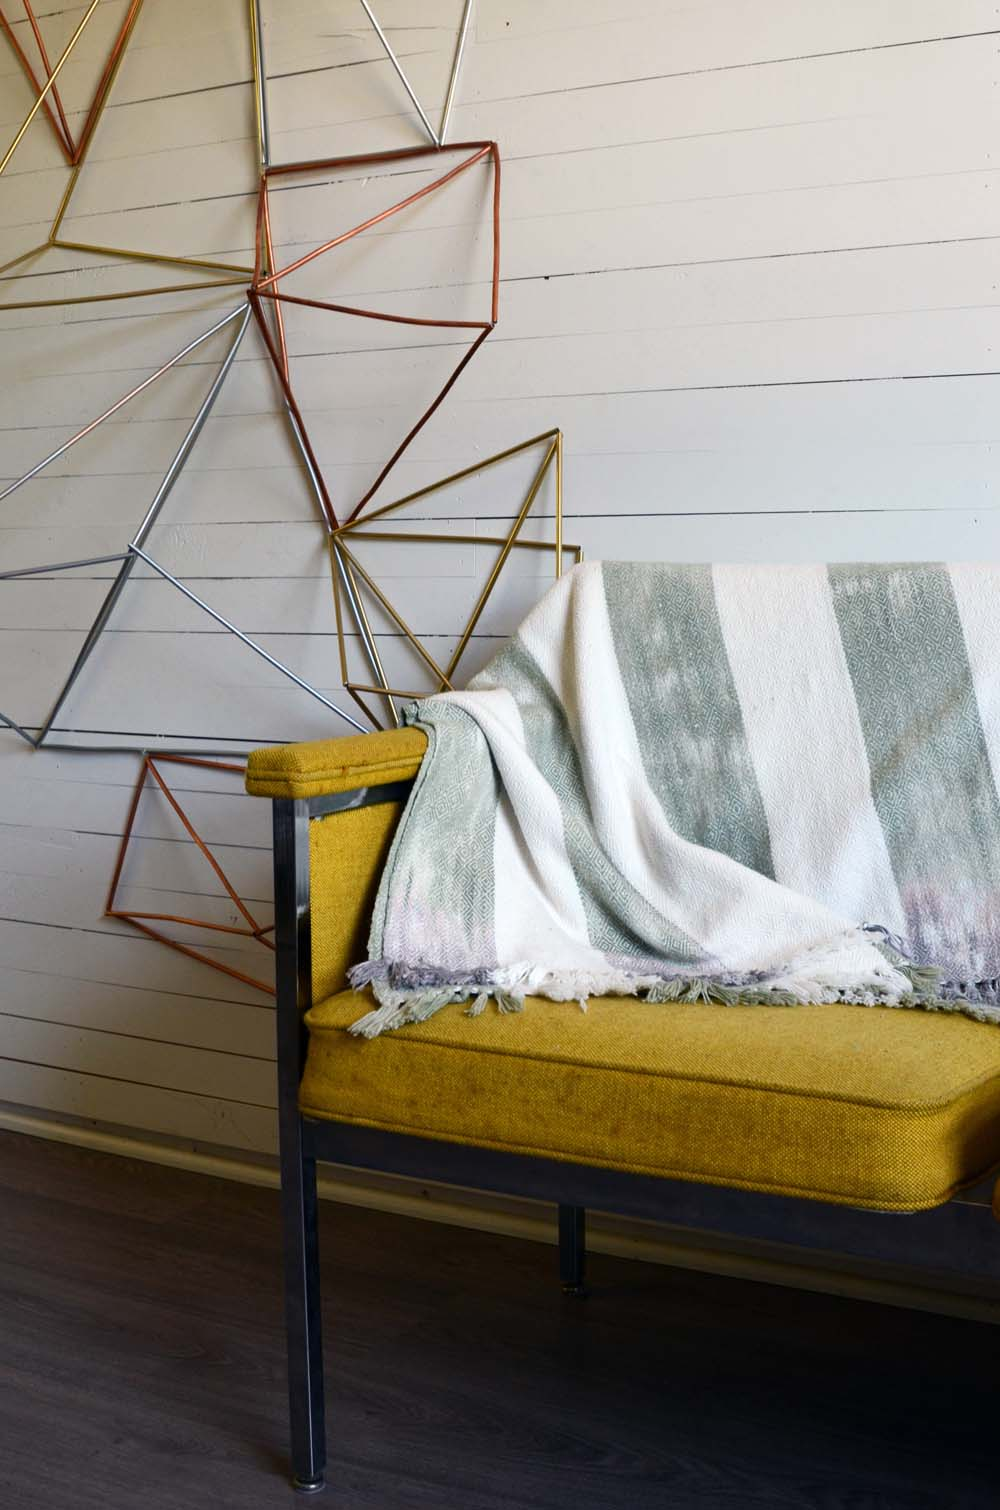 Blankets-3.jpg